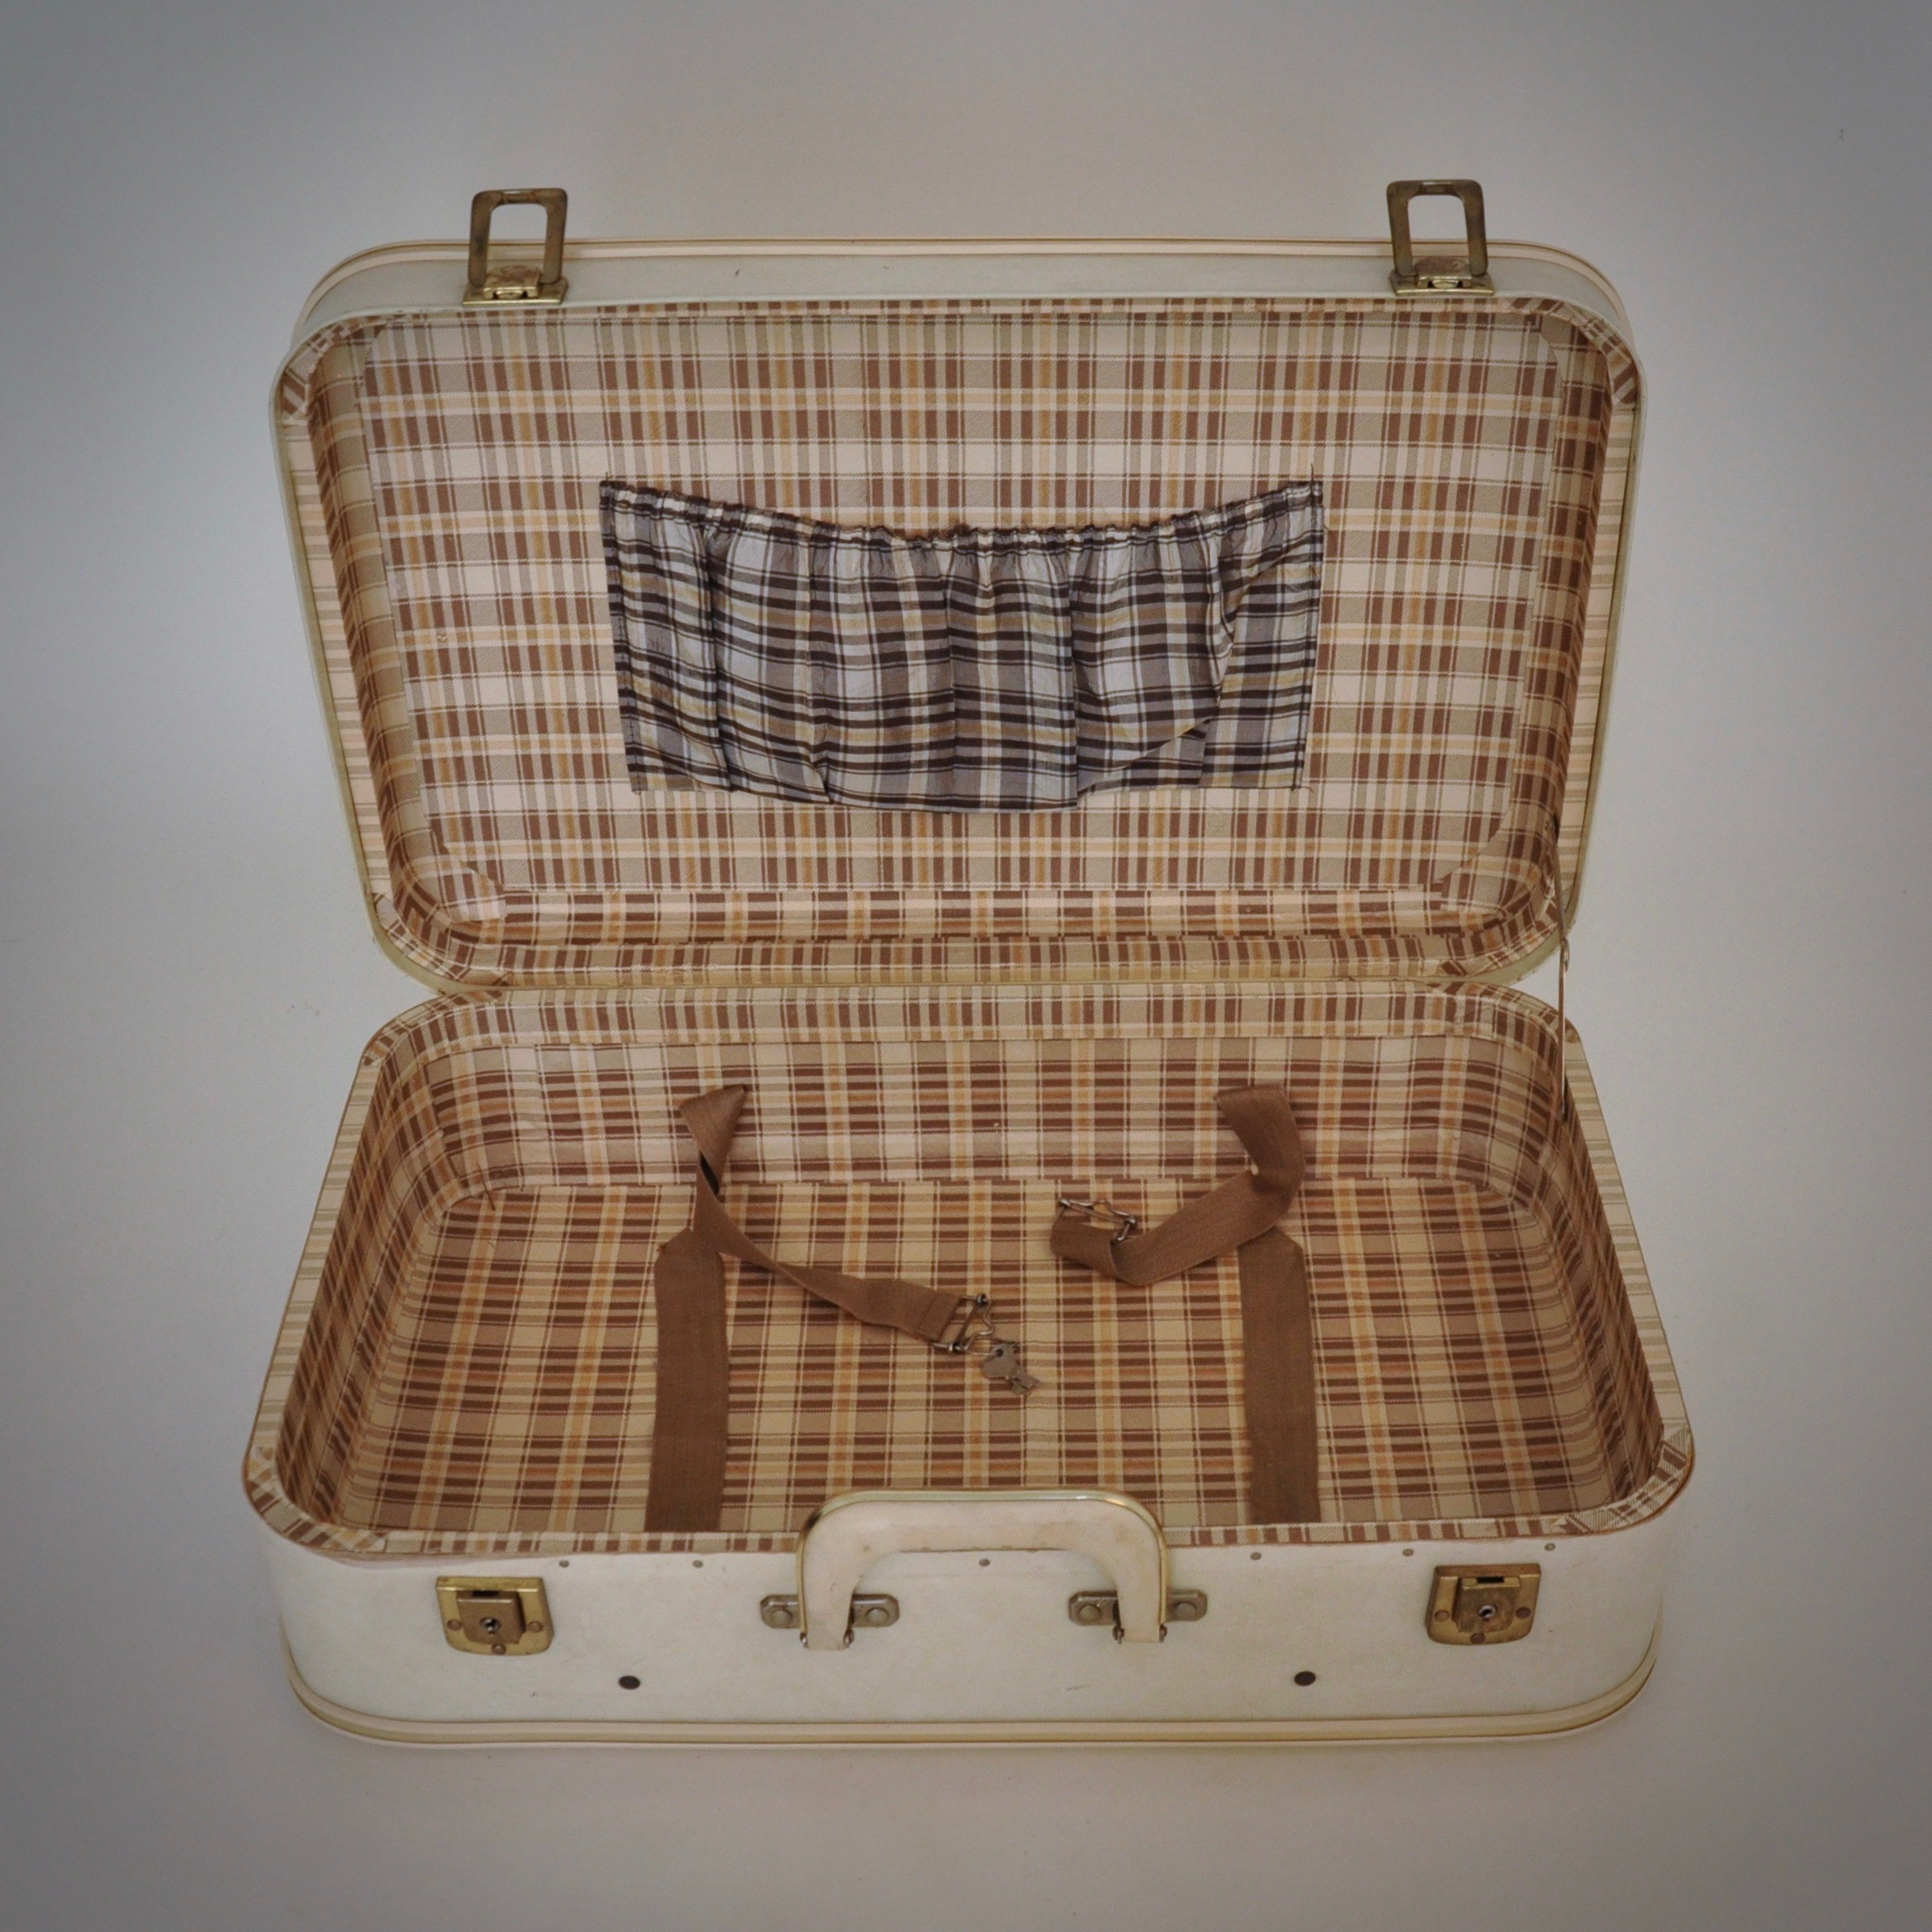 Brocante witte dameskoffer of vintage reiskoffer met gouden elementen